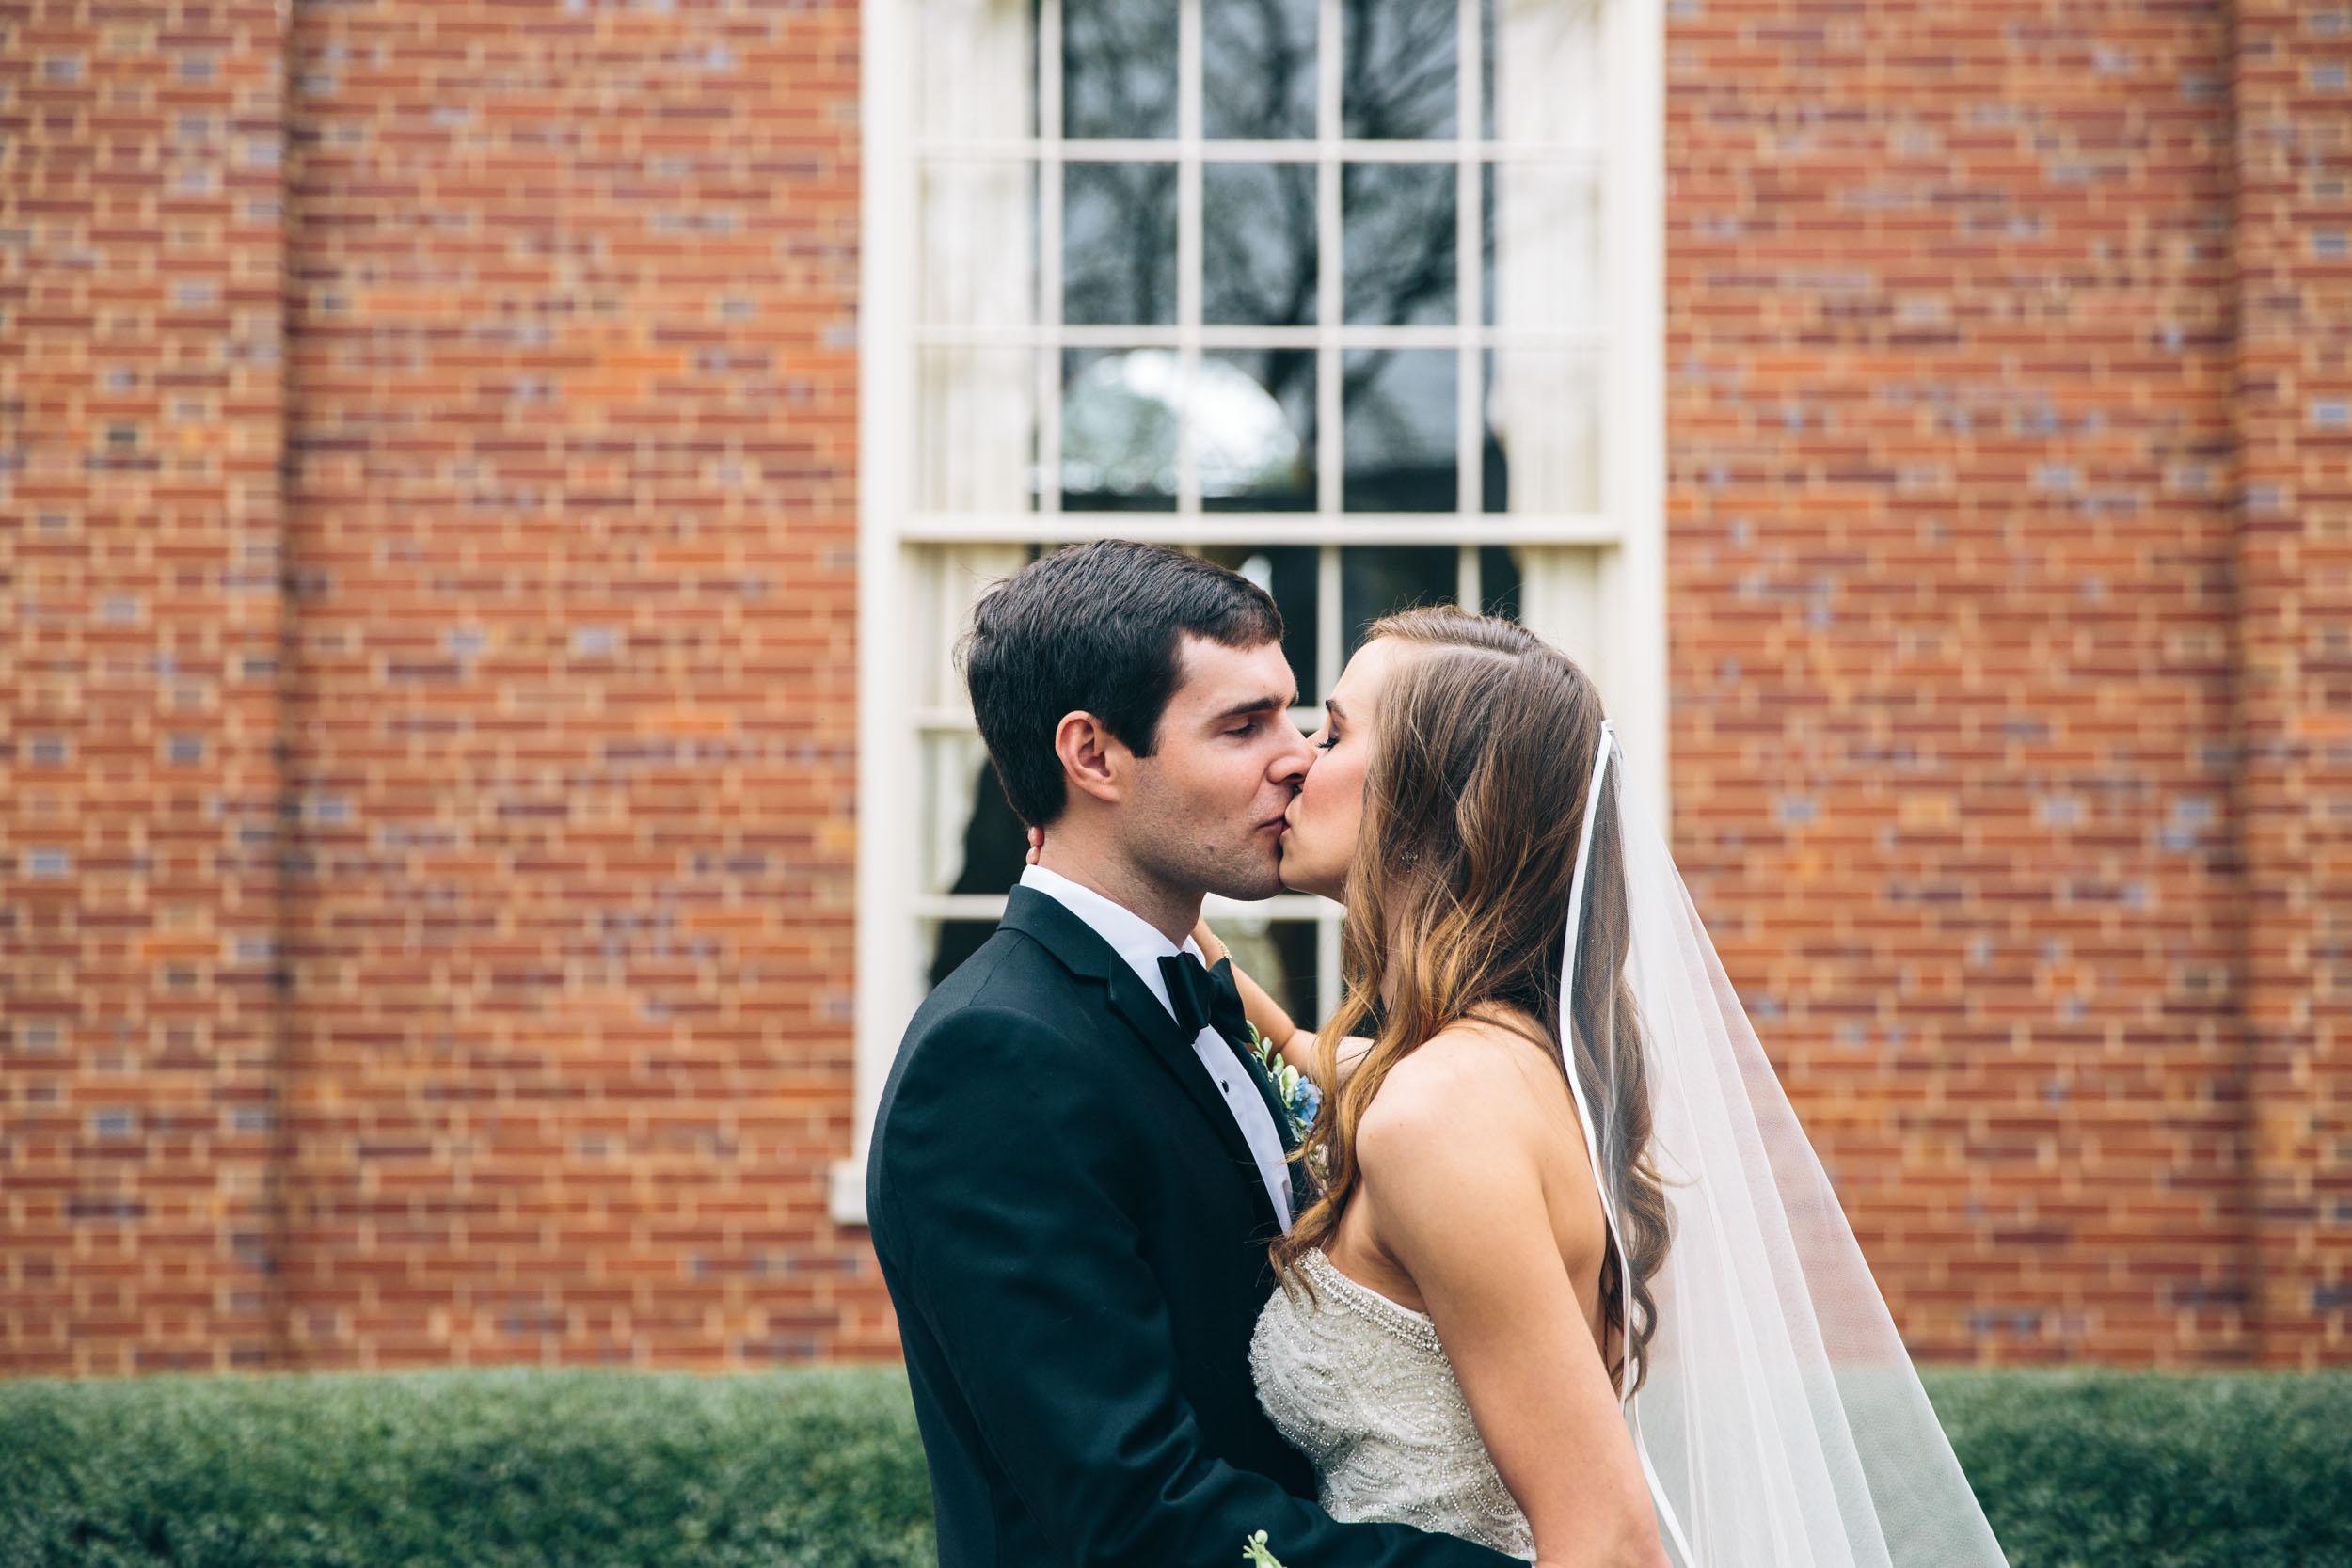 jimmy-rowalt-atlanta-wedding-photography-094.jpg